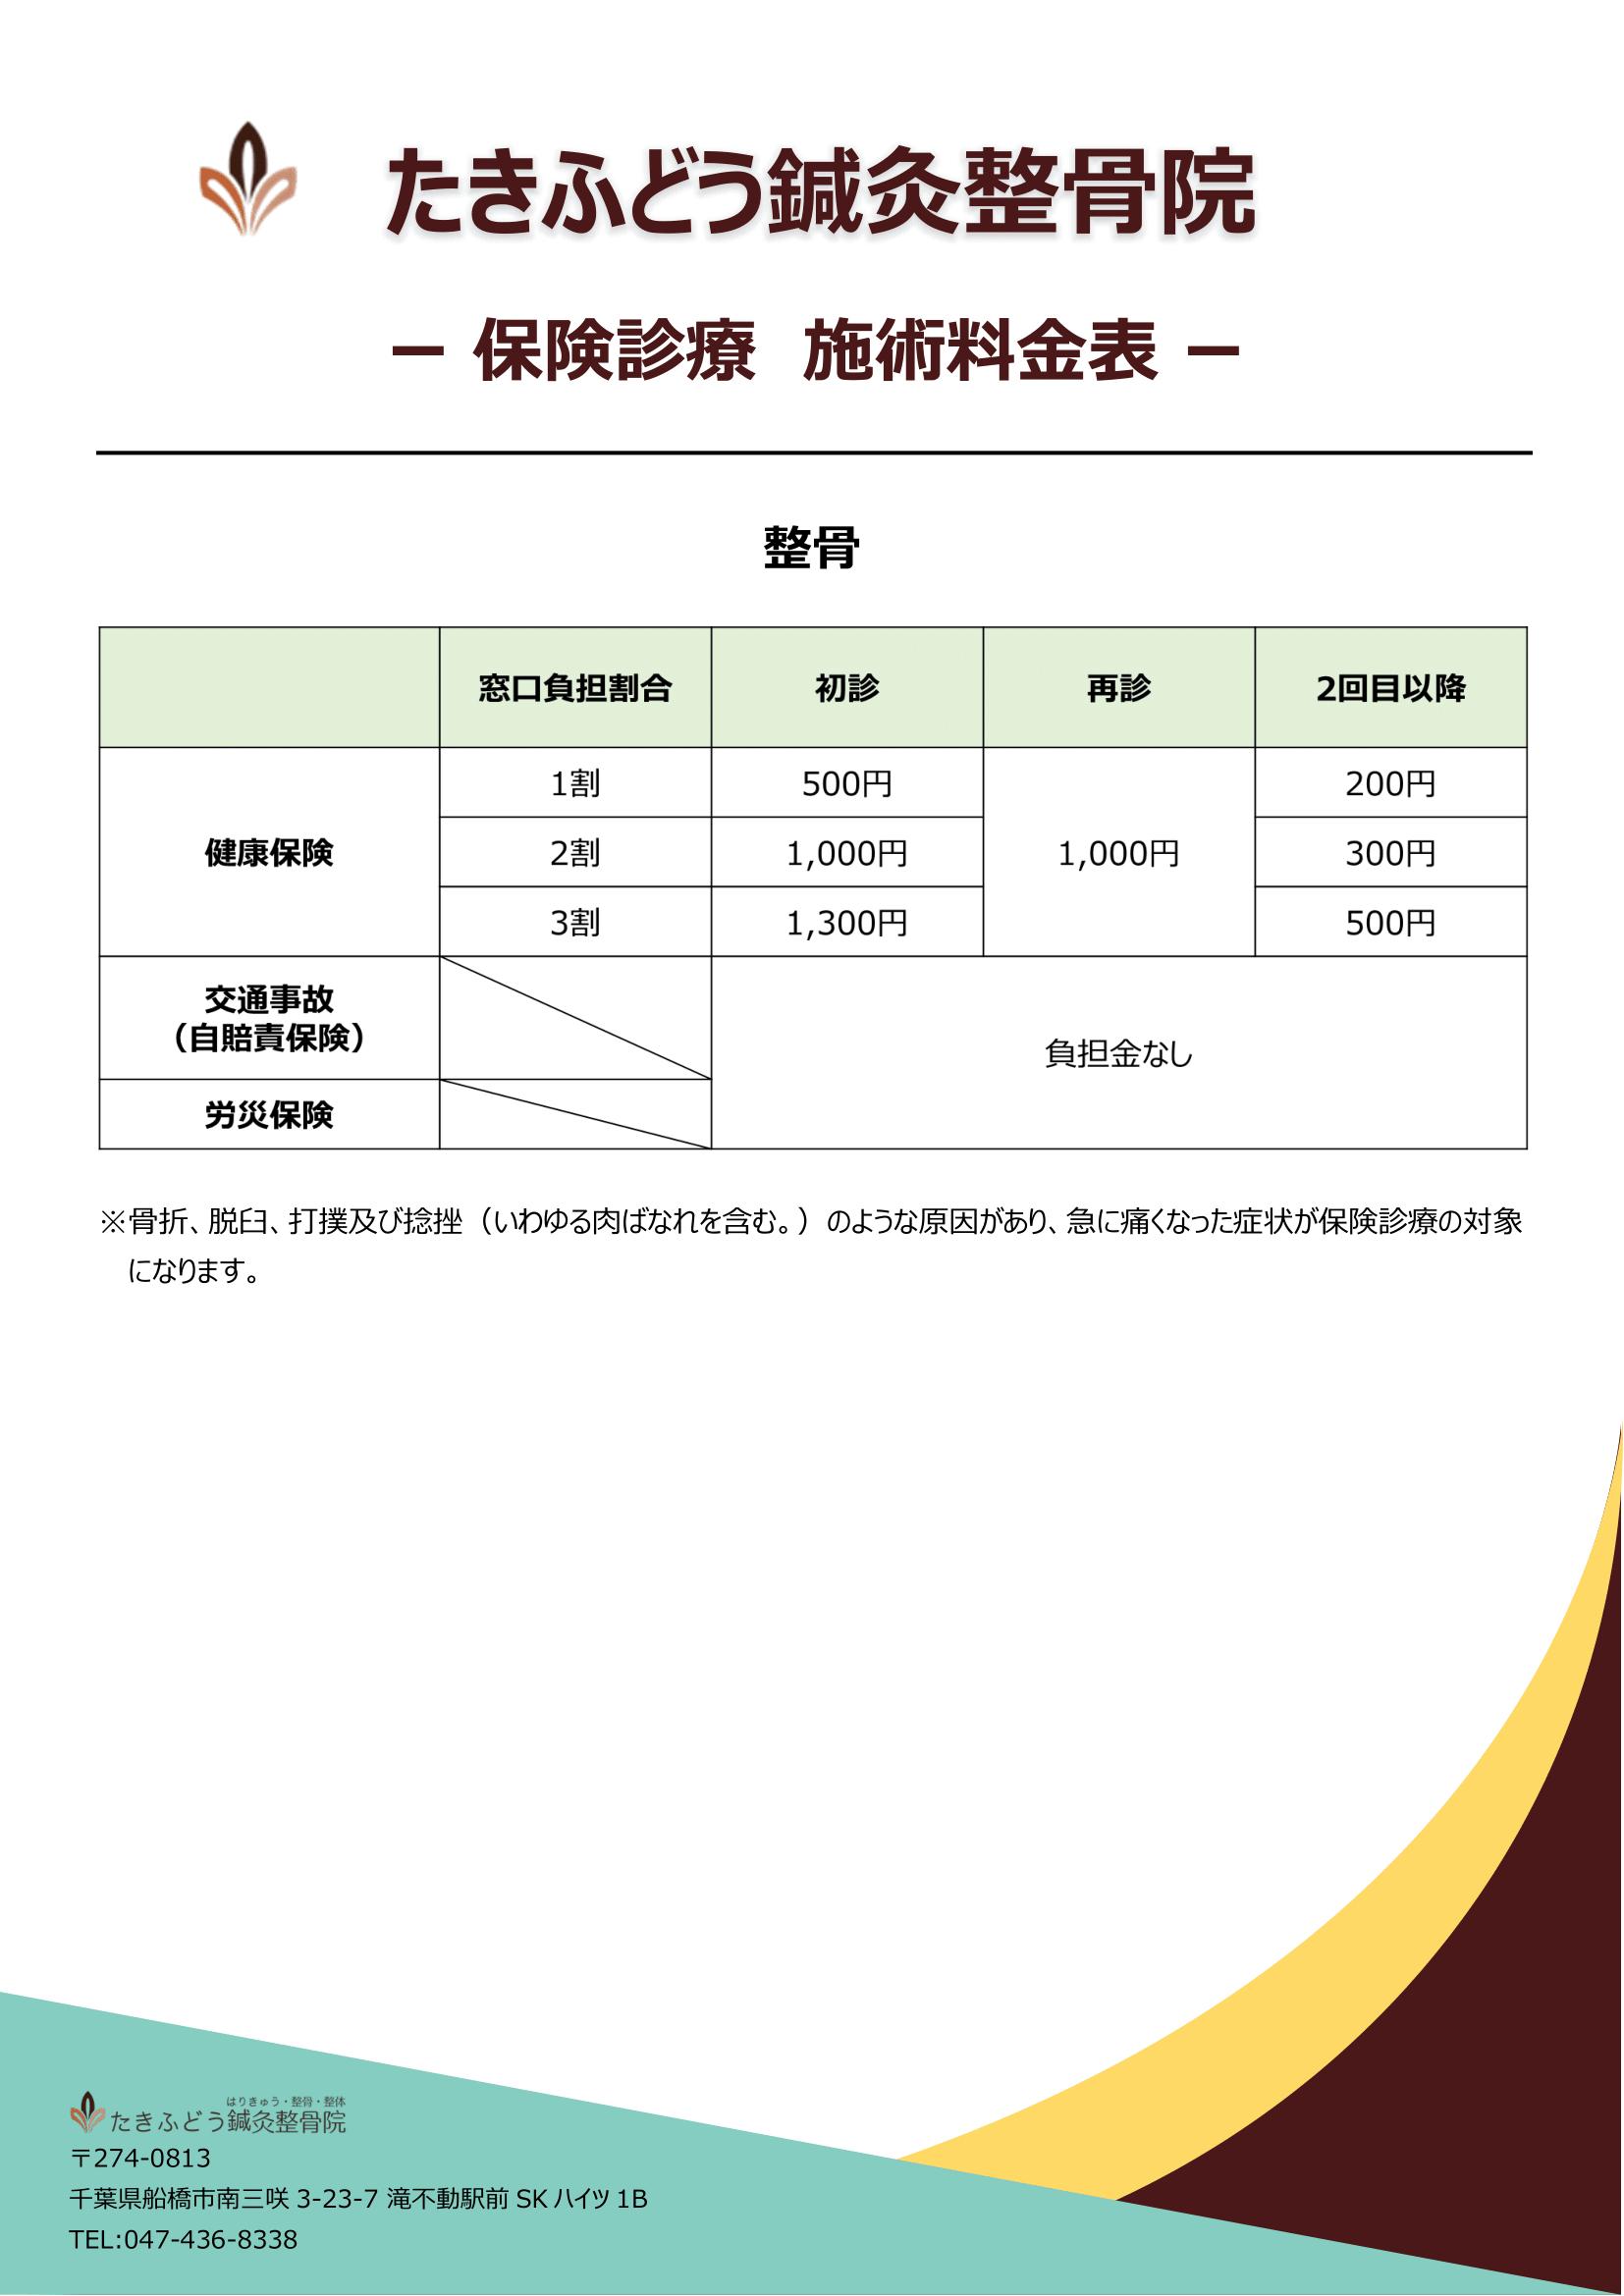 1-medical fees PNG